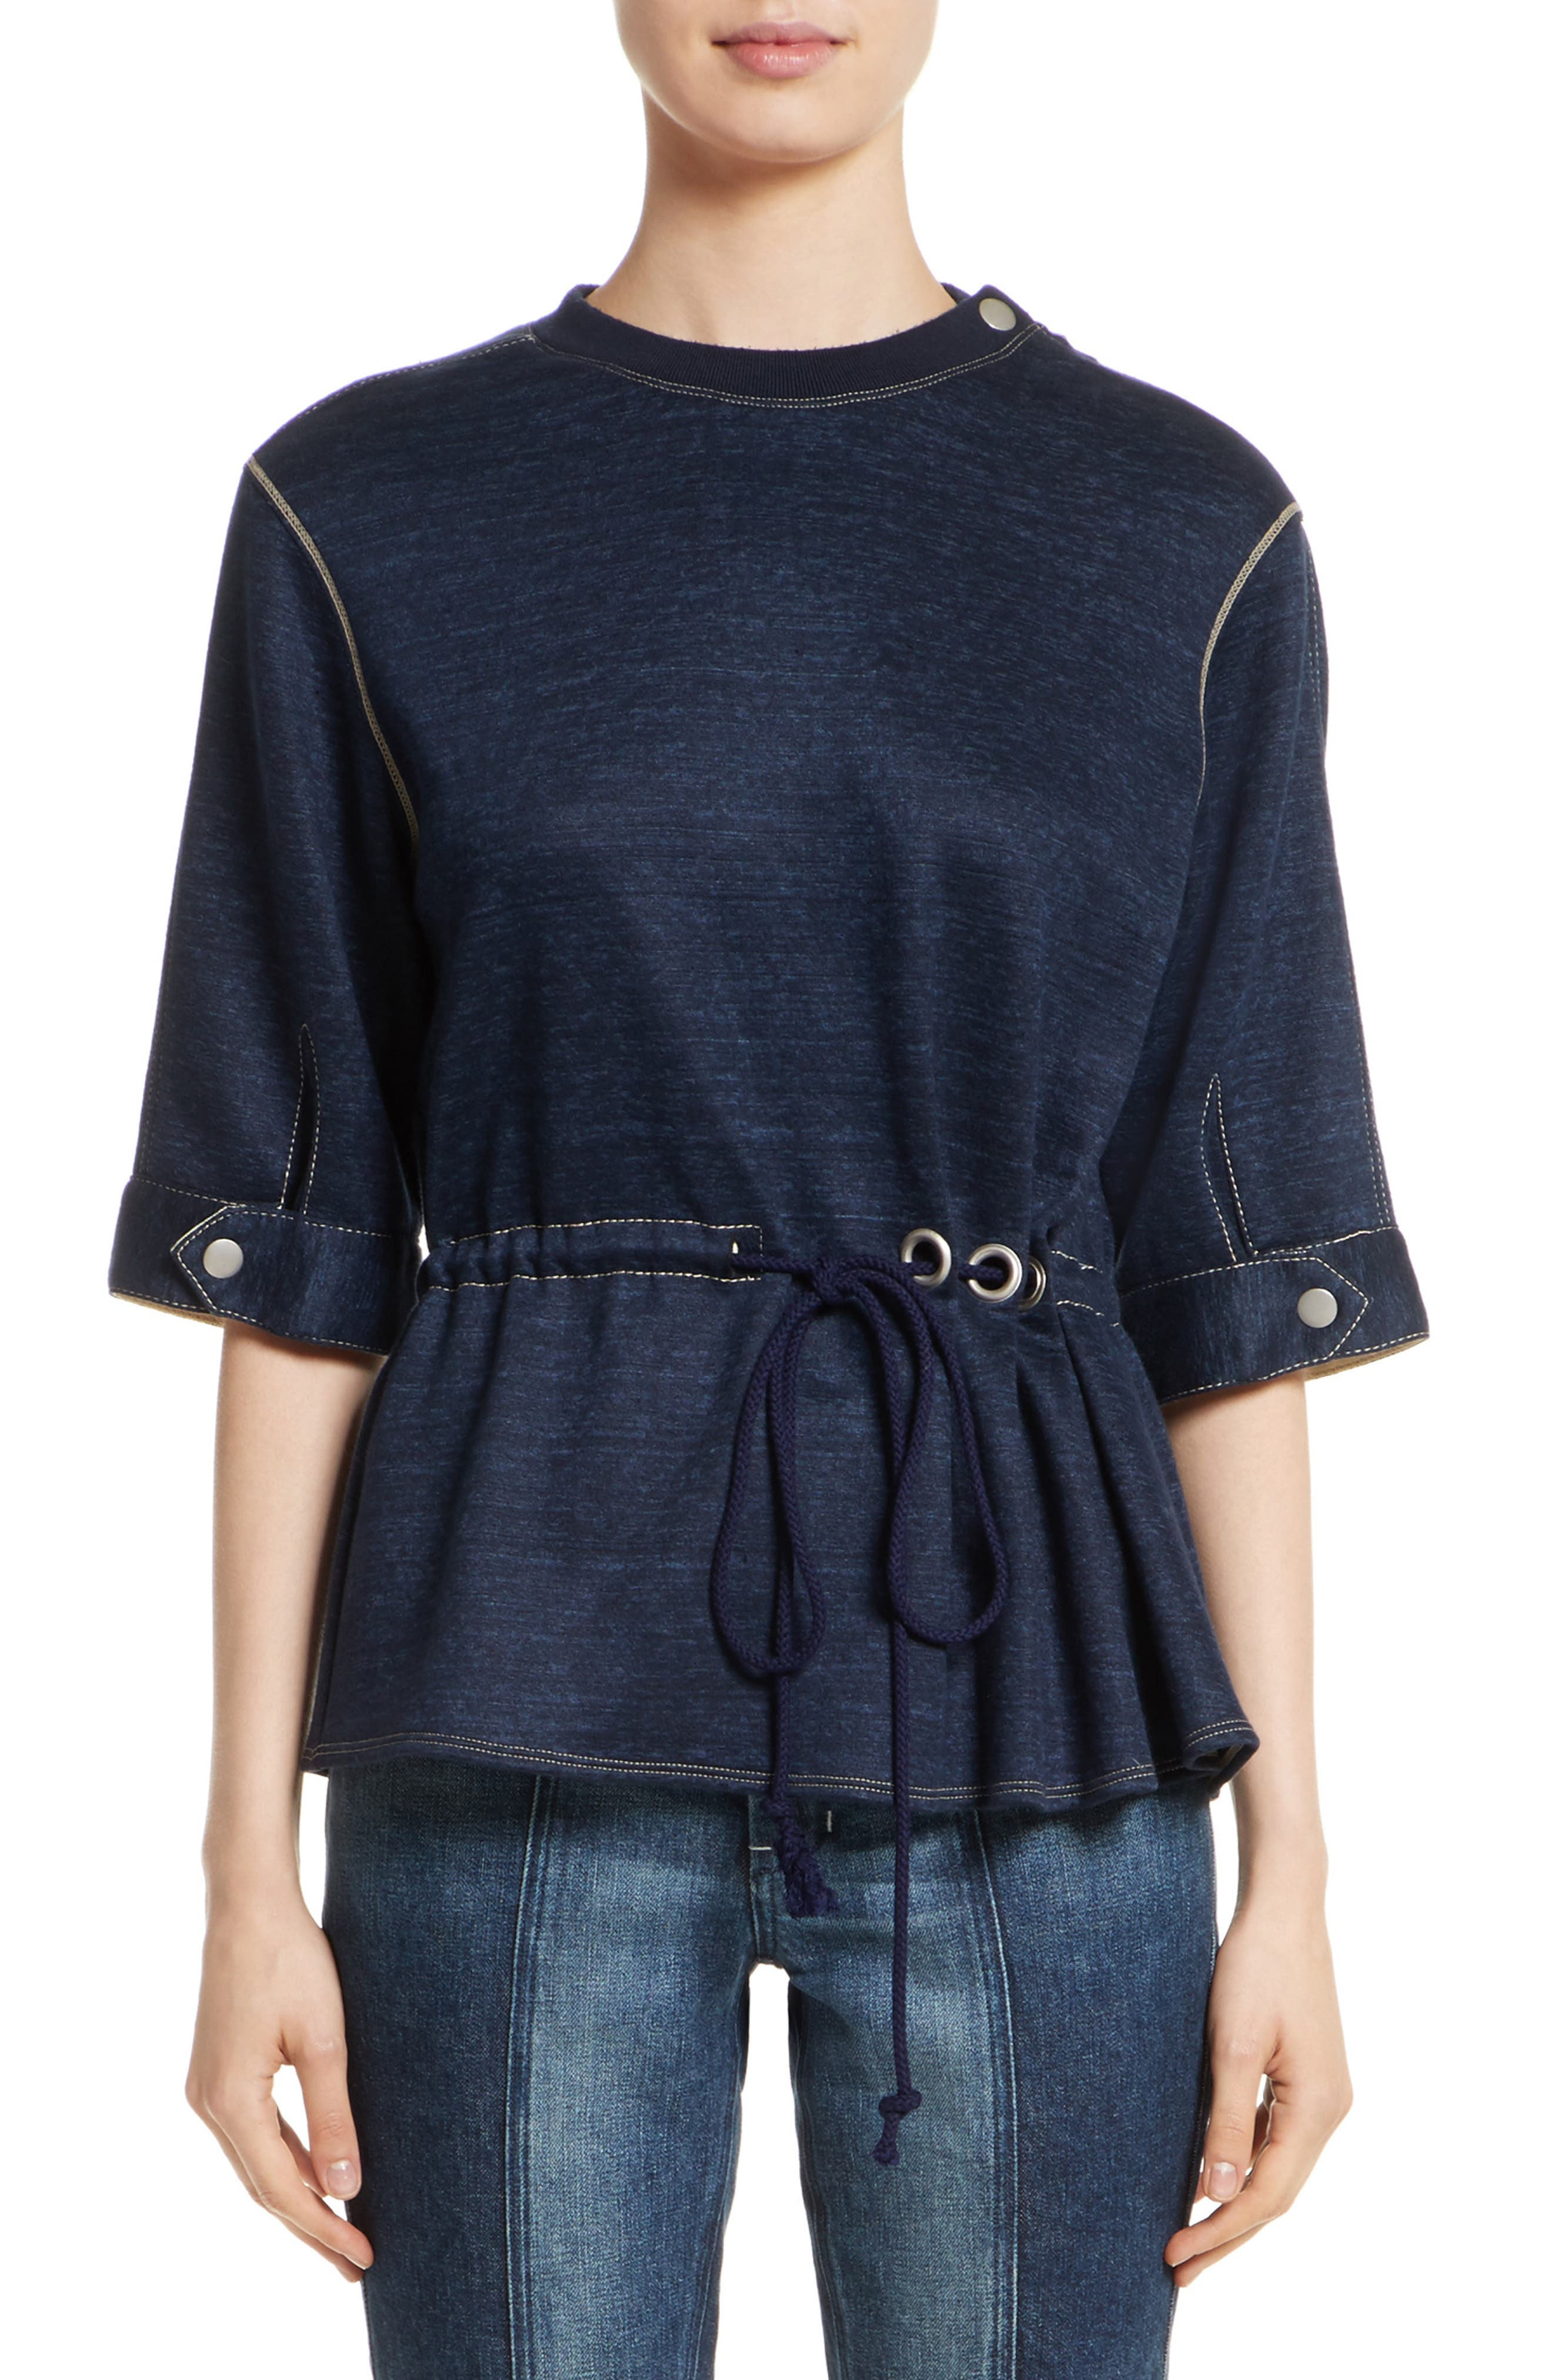 Colovos Drawstring Waist Sweatshirt Top